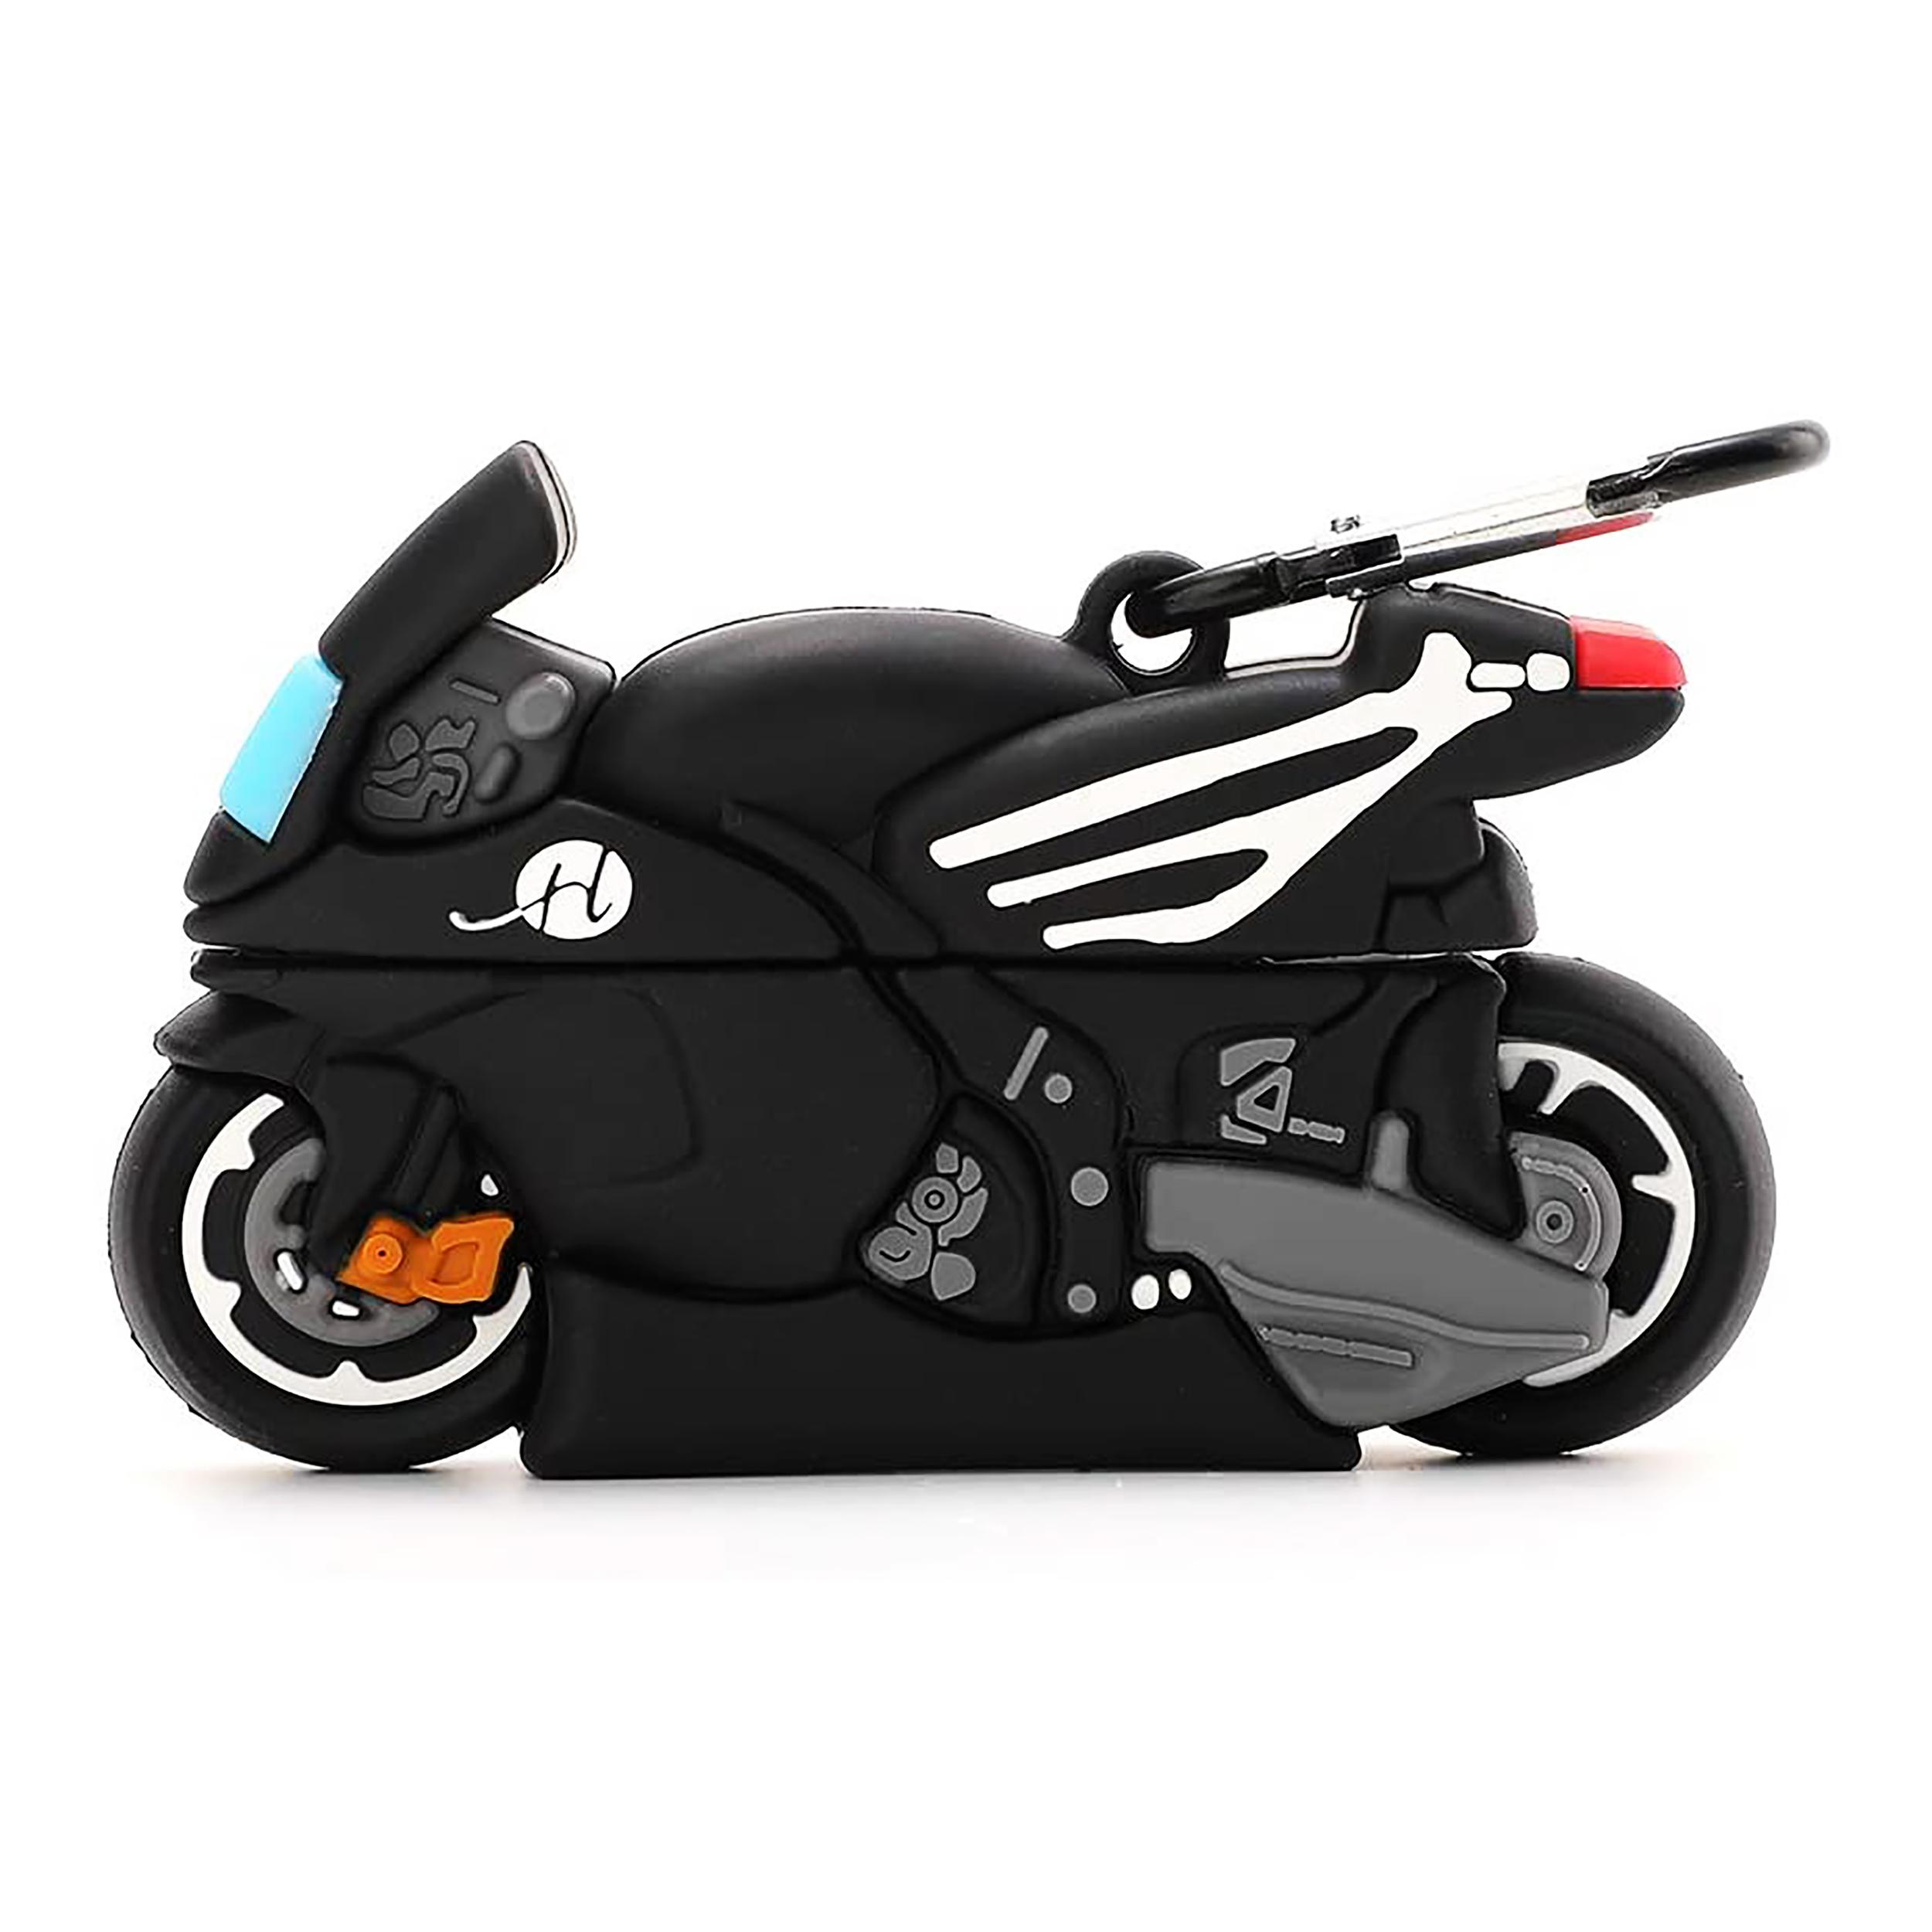 کاور مدل موتورسیکلت کد 01 مناسب برای کیس اپل ایرپاد پرو